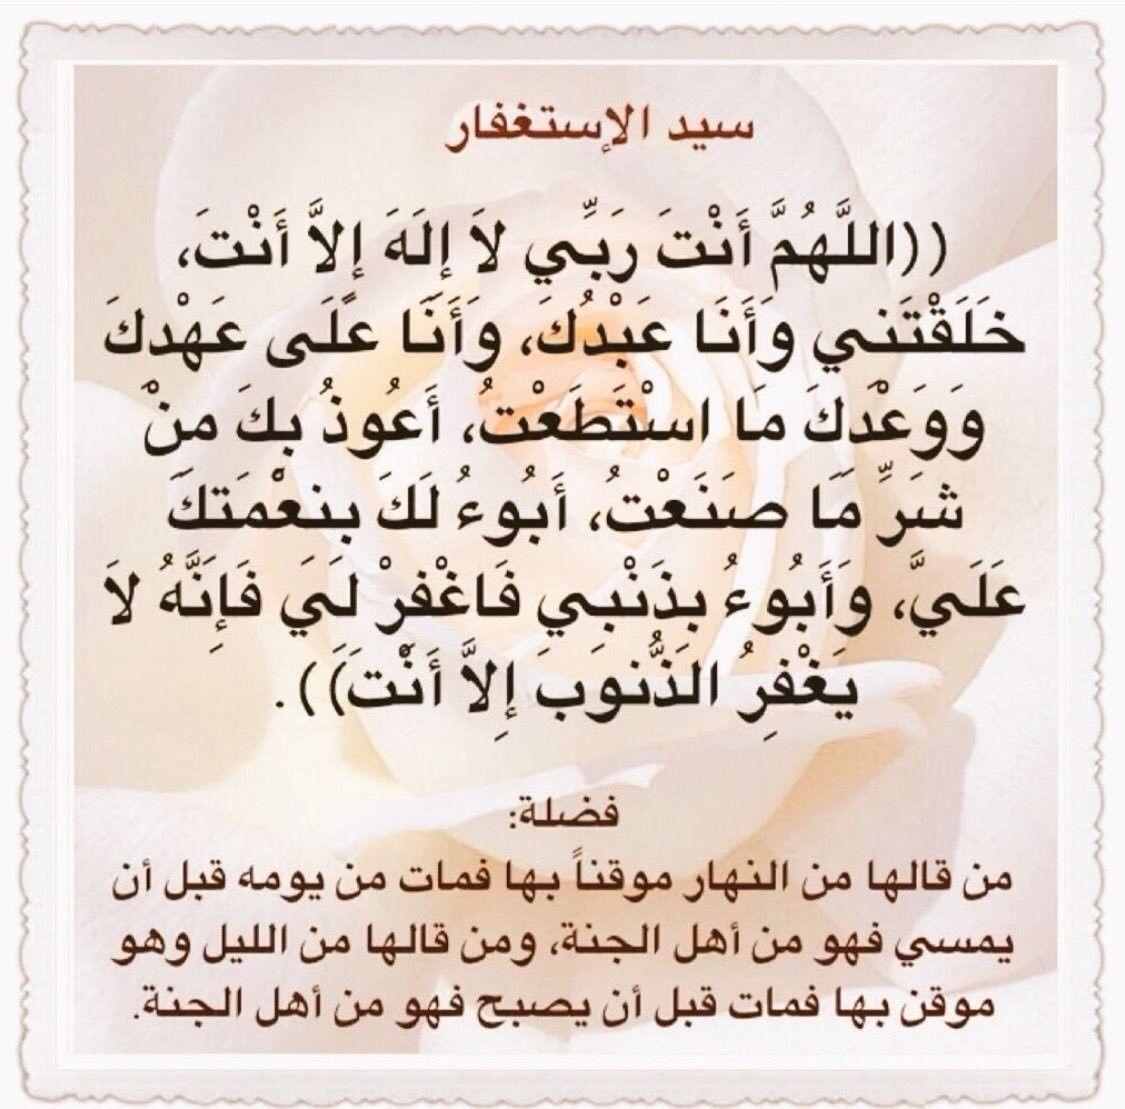 Pin By The Noble Quran On I Love Allah Quran Islam The Prophet Miracles Hadith Heaven Prophets Faith Prayer Dua حكم وعبر احاديث الله اسلام قرآن دعاء Dua Personalized Items Person